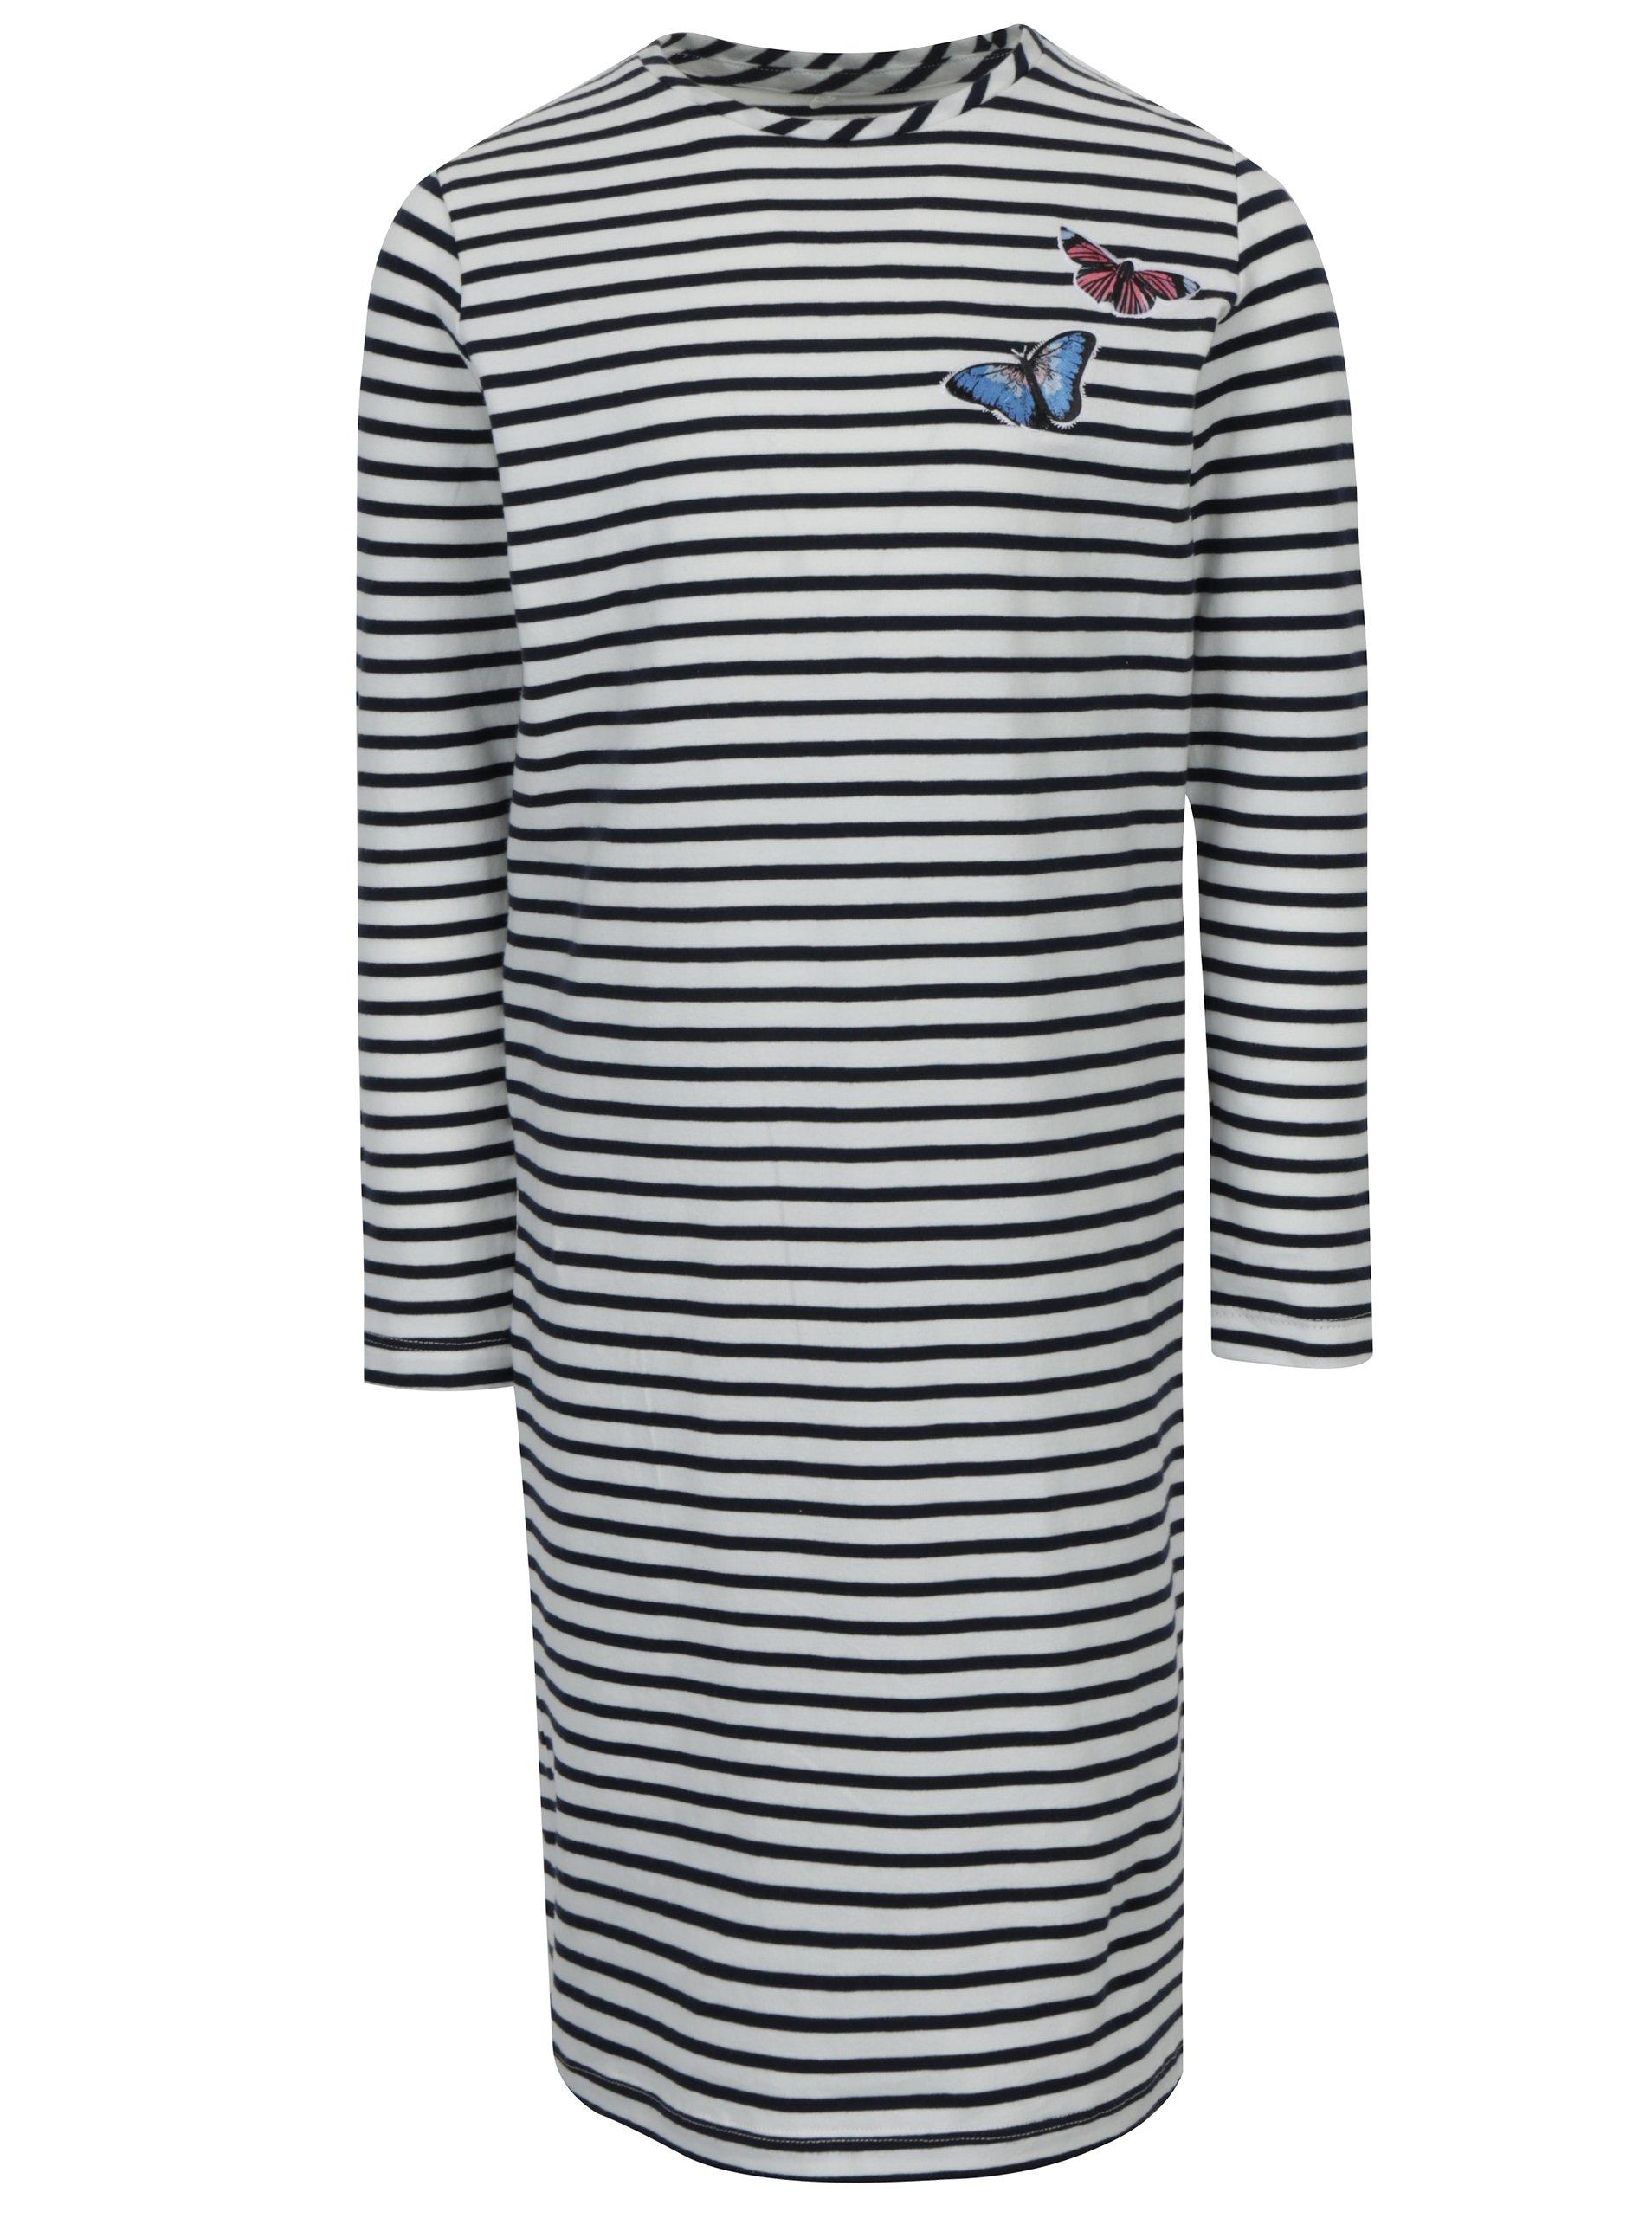 a691aed9fbbf Modro–biele pruhované šaty name it Kasja